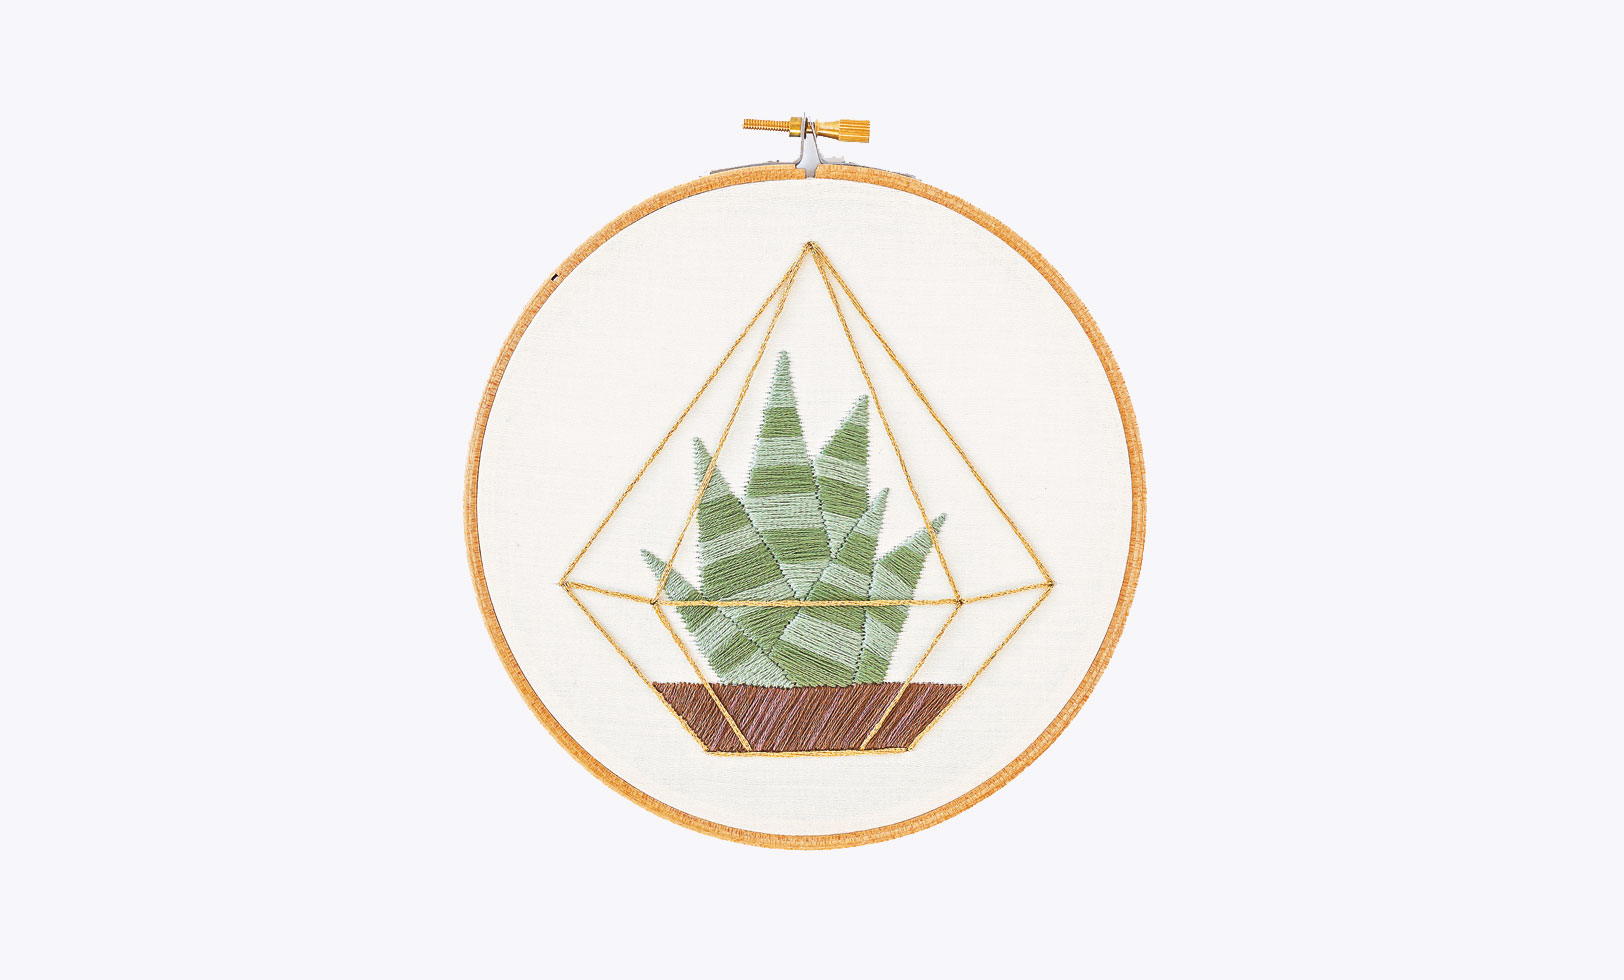 Edgy-Embroidery-Geometric-Succulent-Terrarium